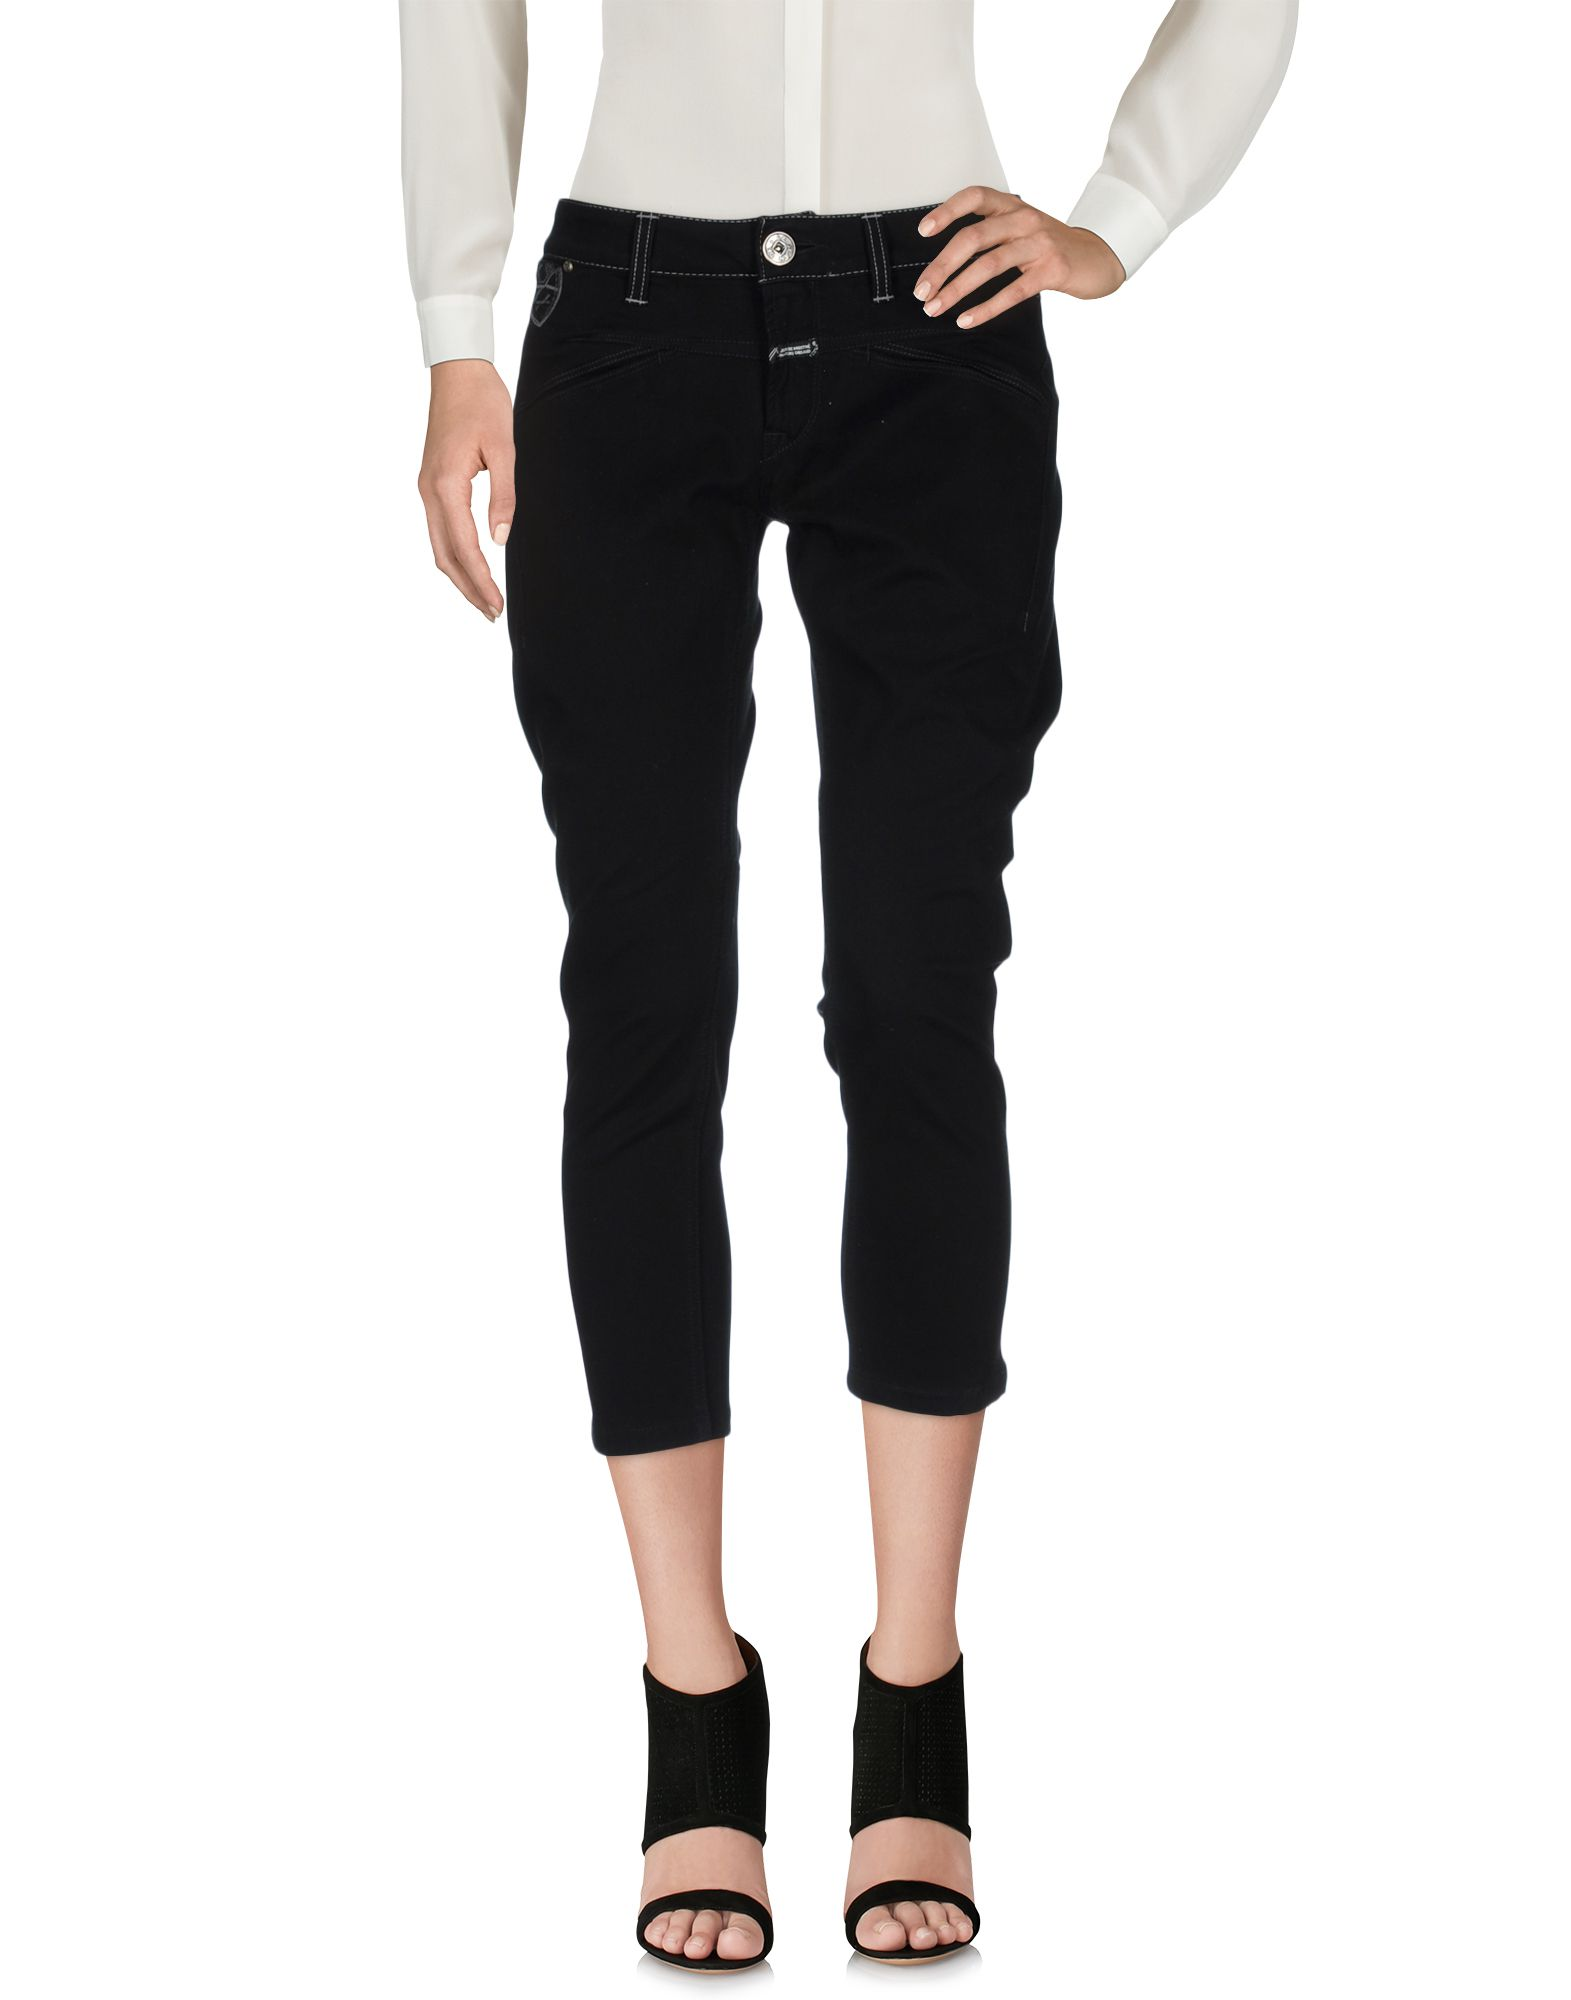 LE JEAN DE MARITHÉ + FRANÇOIS GIRBAUD Брюки-капри le jean de marithé françois girbaud джинсовая юбка